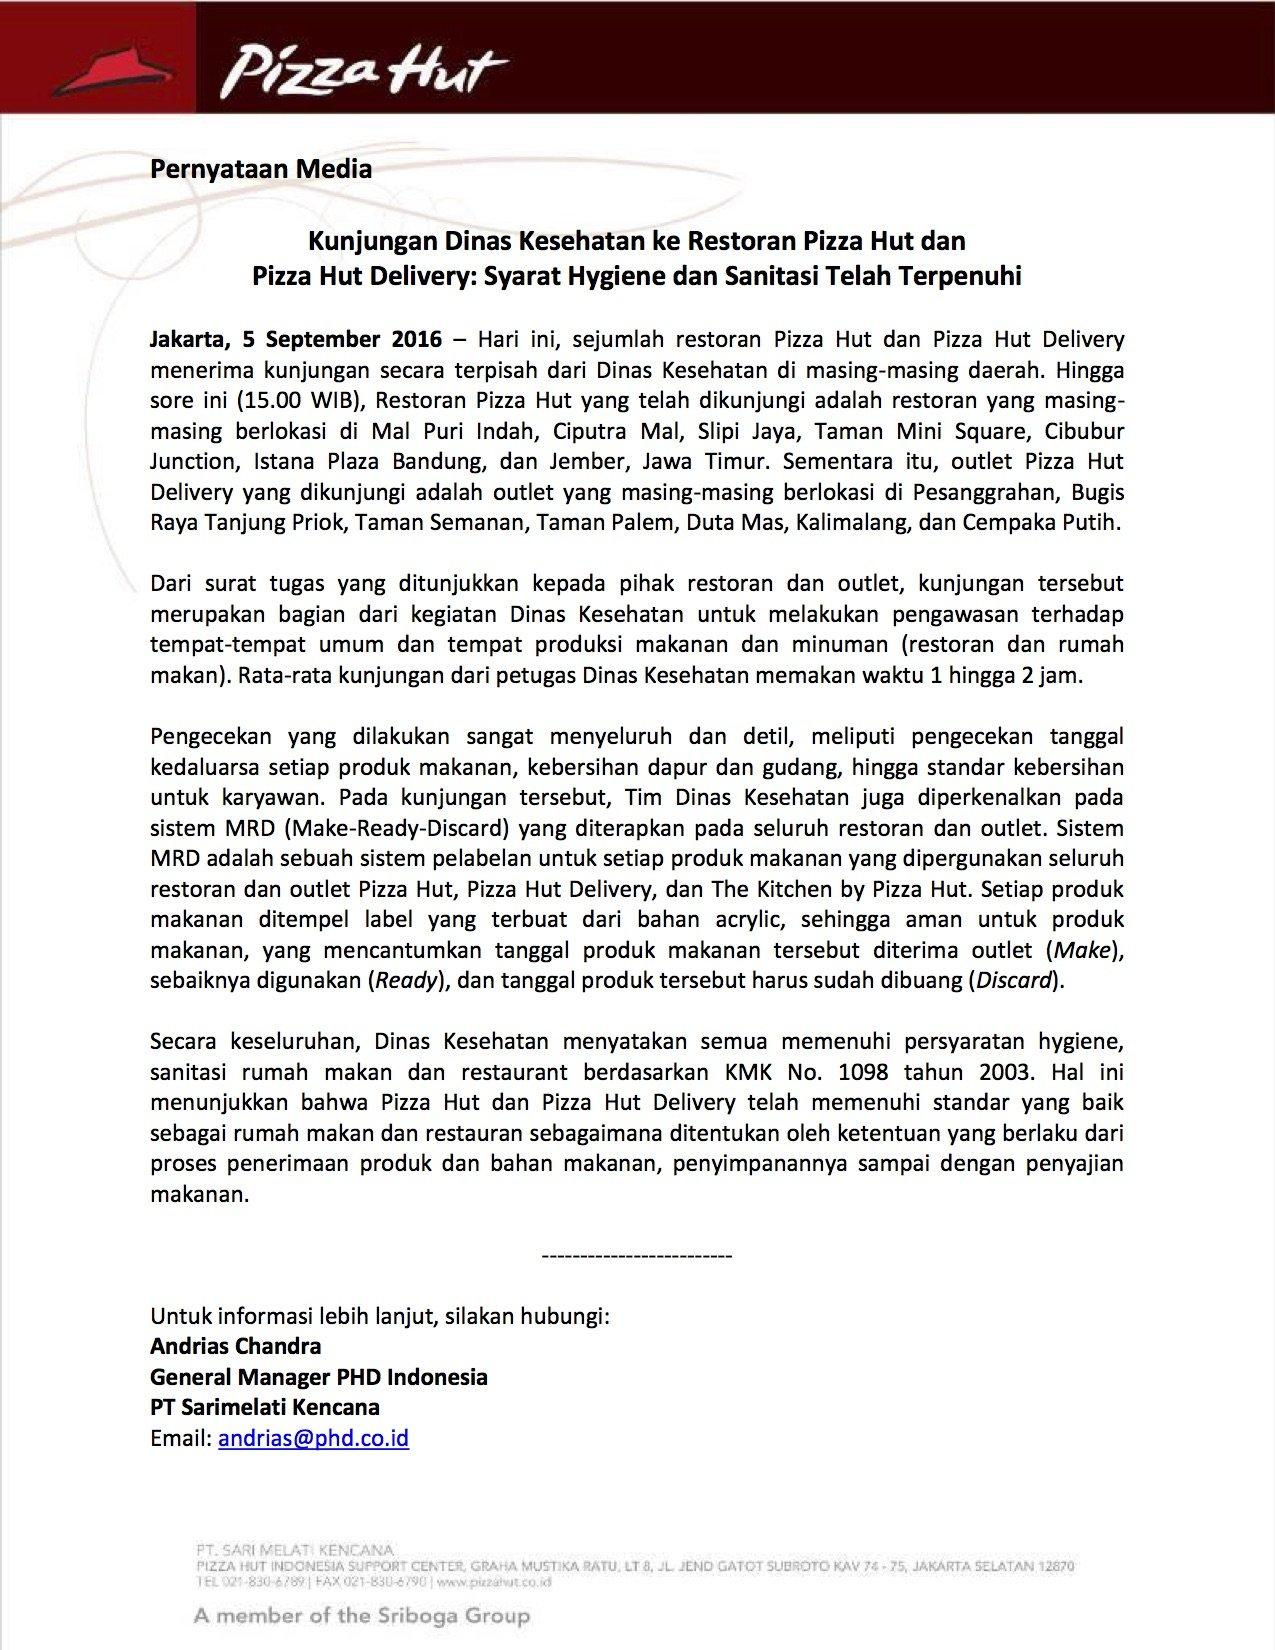 Dinas Kesehatan mengunjungi gerai Pizza Hut & PHD, mrk menyatakan syarat hygiene telah terpenuhi #UngkapDenganFakta https://t.co/TYAIikftIB